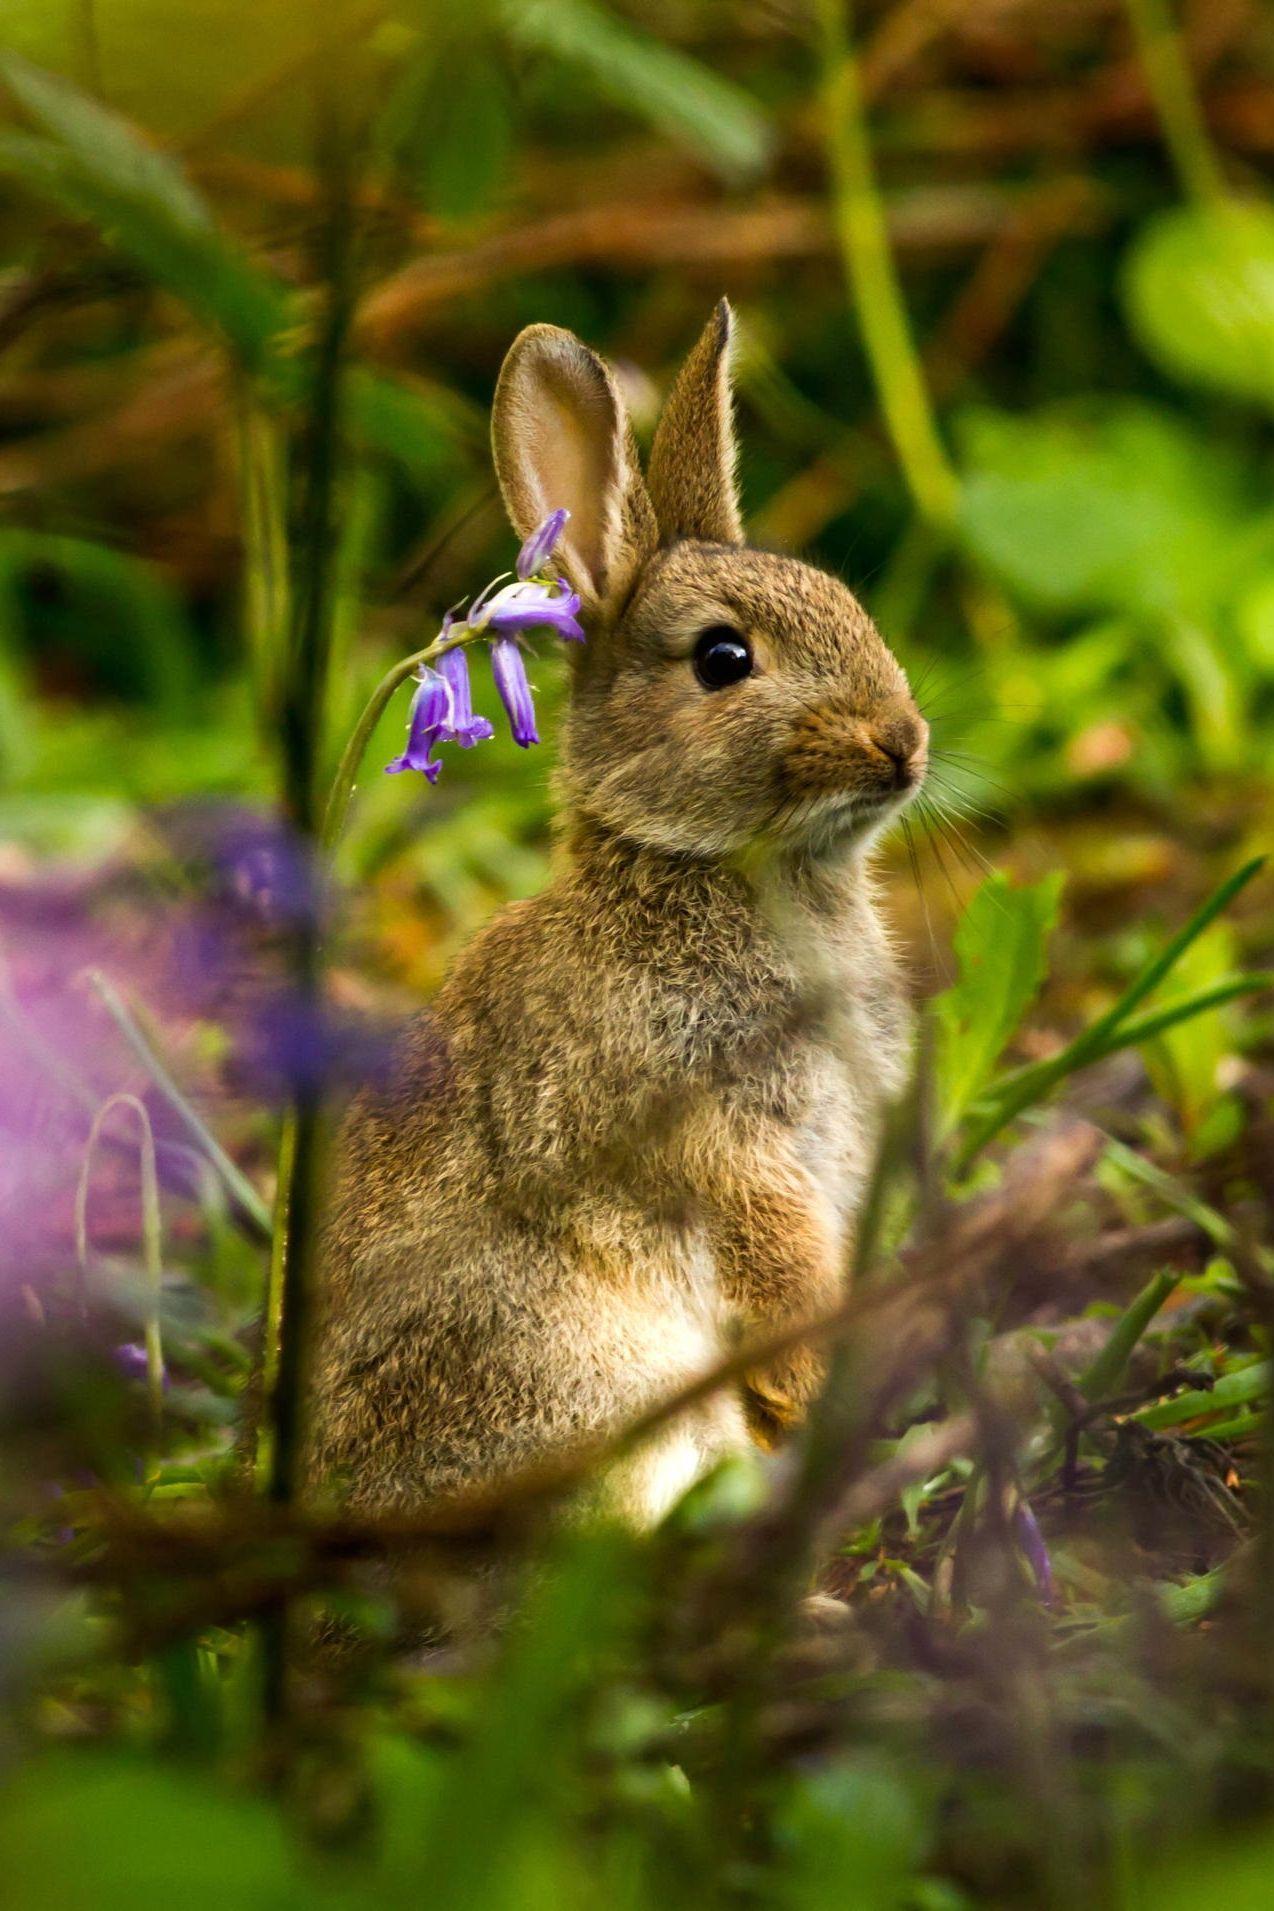 Rabbit in the Bluebells by Dulcie Mae